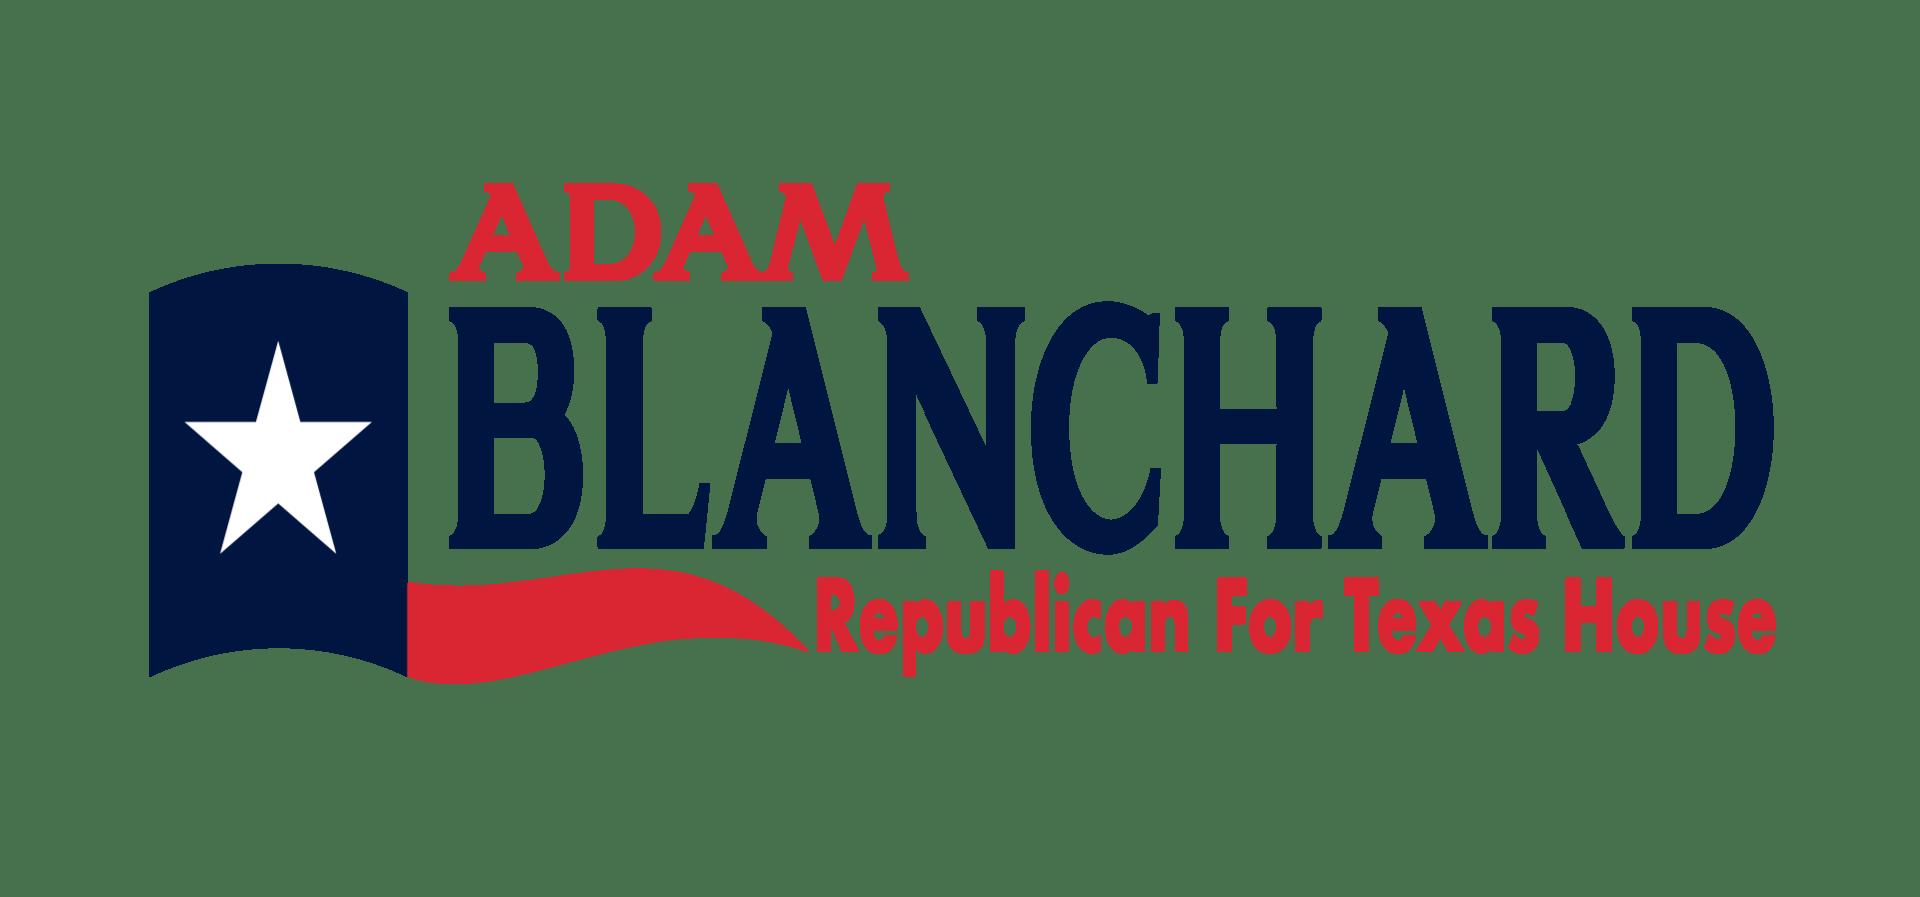 2021.09.30   logo adamblanchard ls f